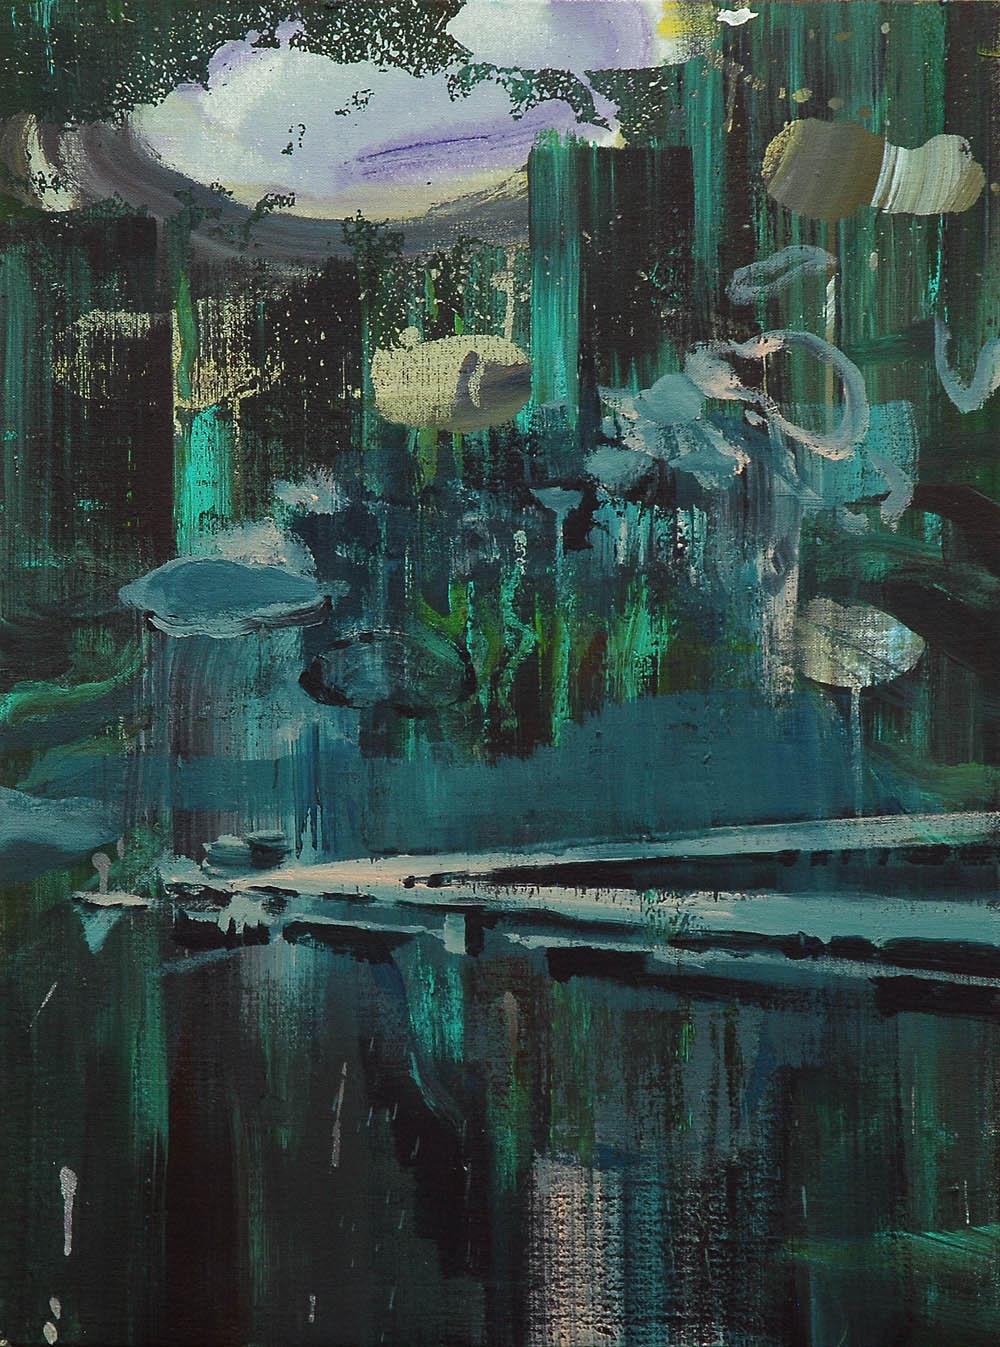 Lu Song 吕松, Empty Dock 空码头, 2015, Oil on canvas 布面油画, 60 x 80 cm